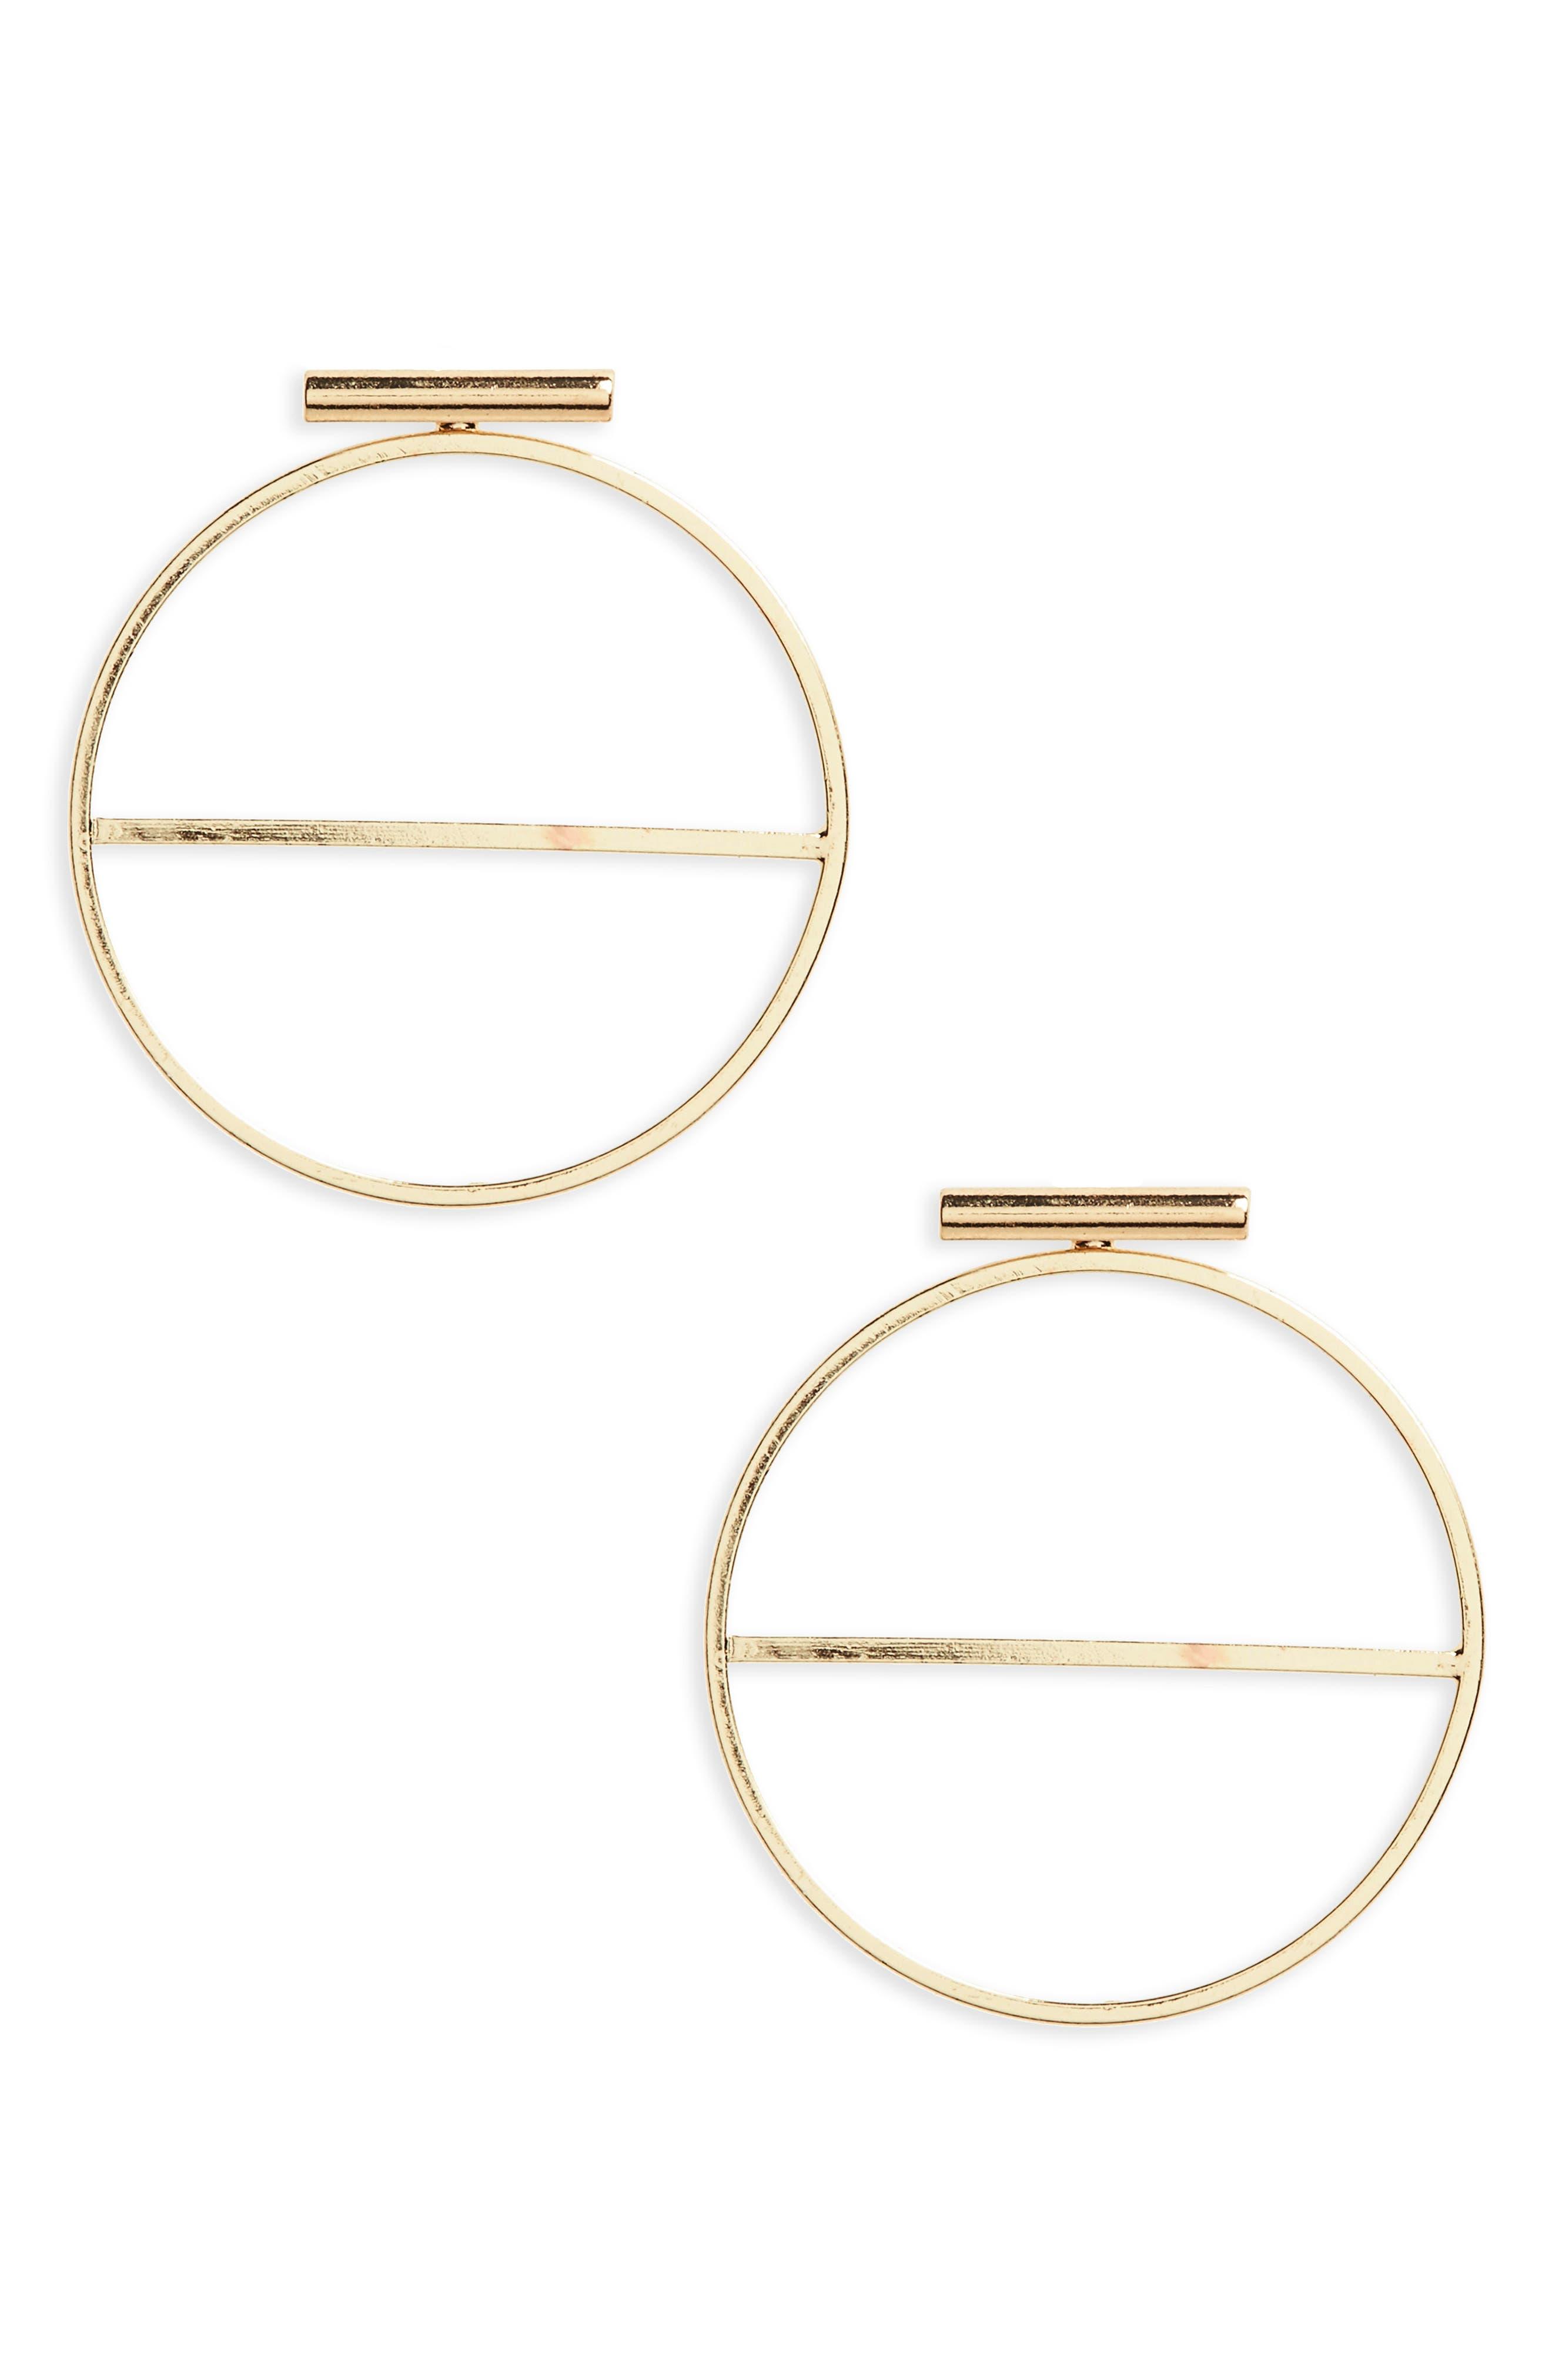 Circle Bar Earrings,                             Main thumbnail 1, color,                             710